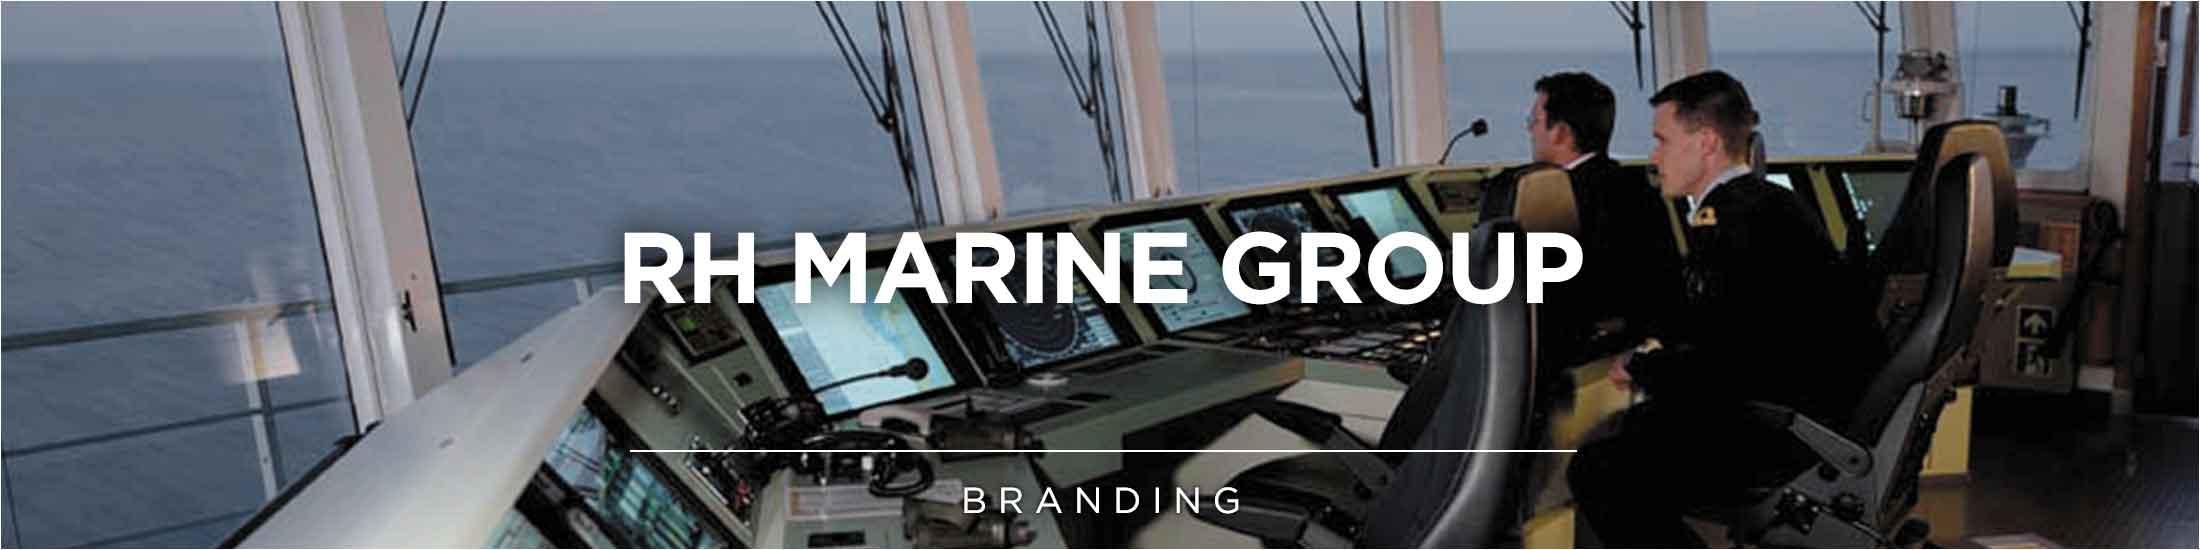 RH Marine